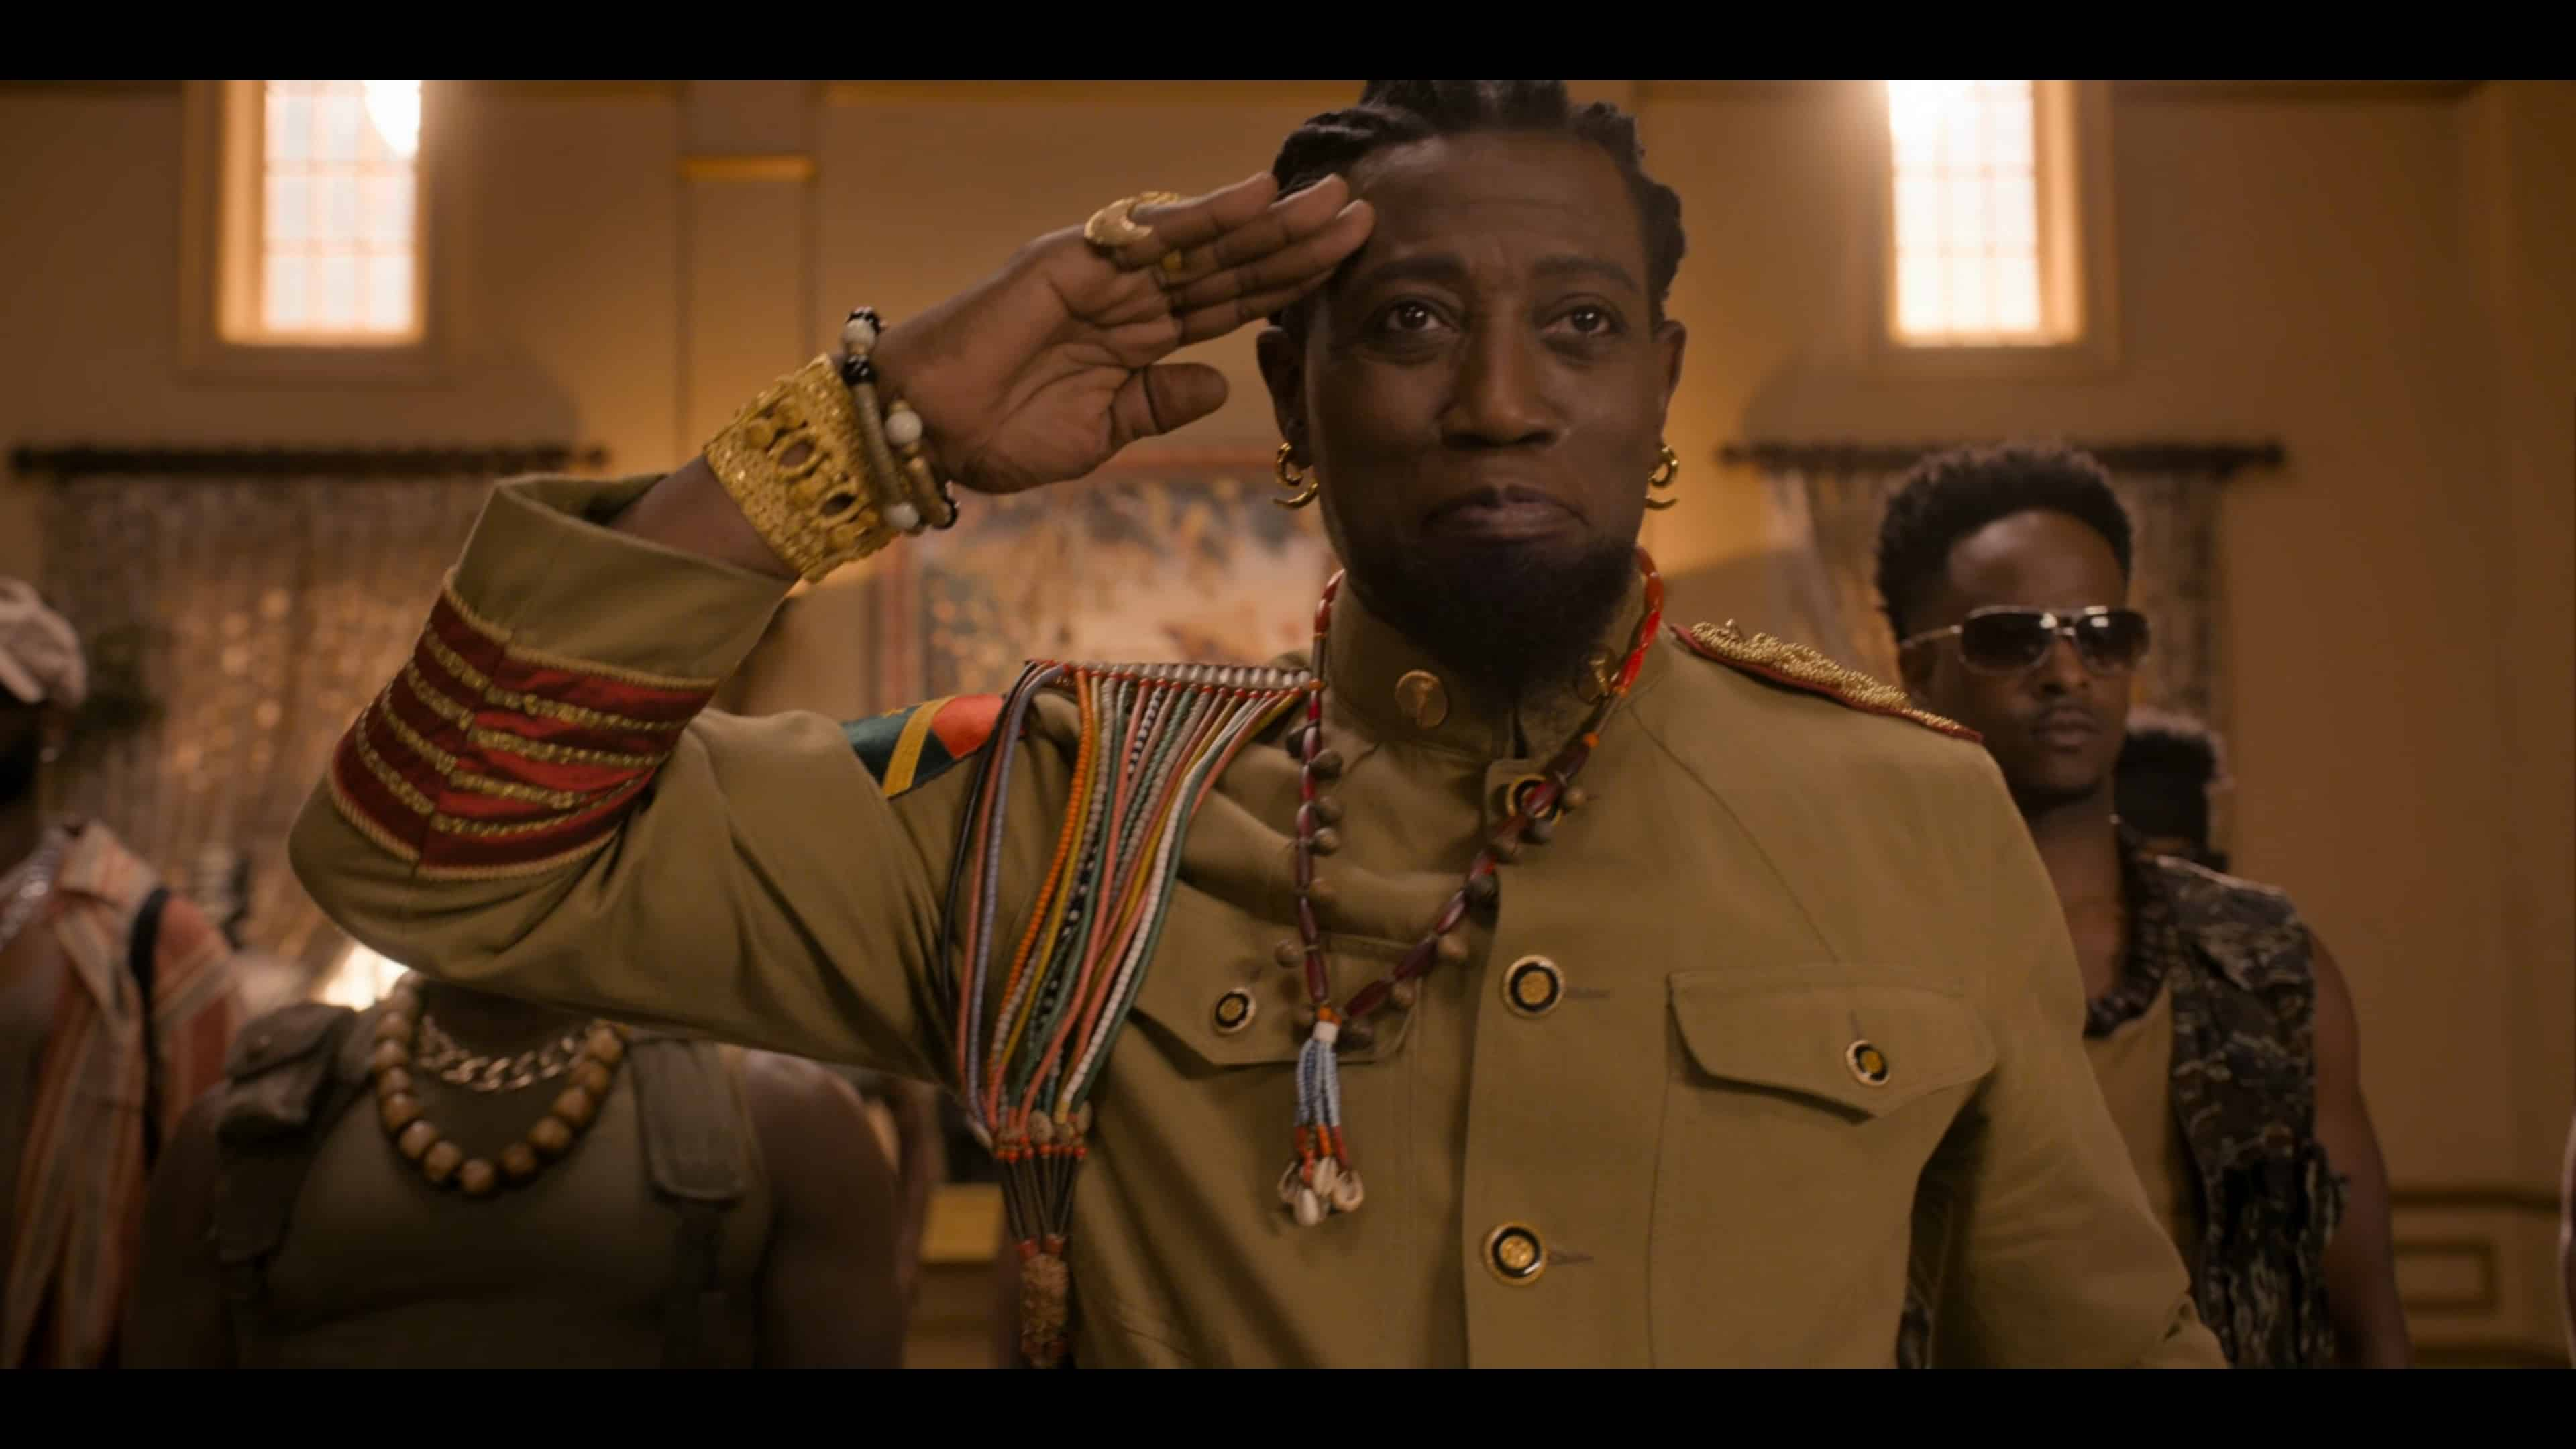 General Izzi (Wesley Snipes) saluting Akeem